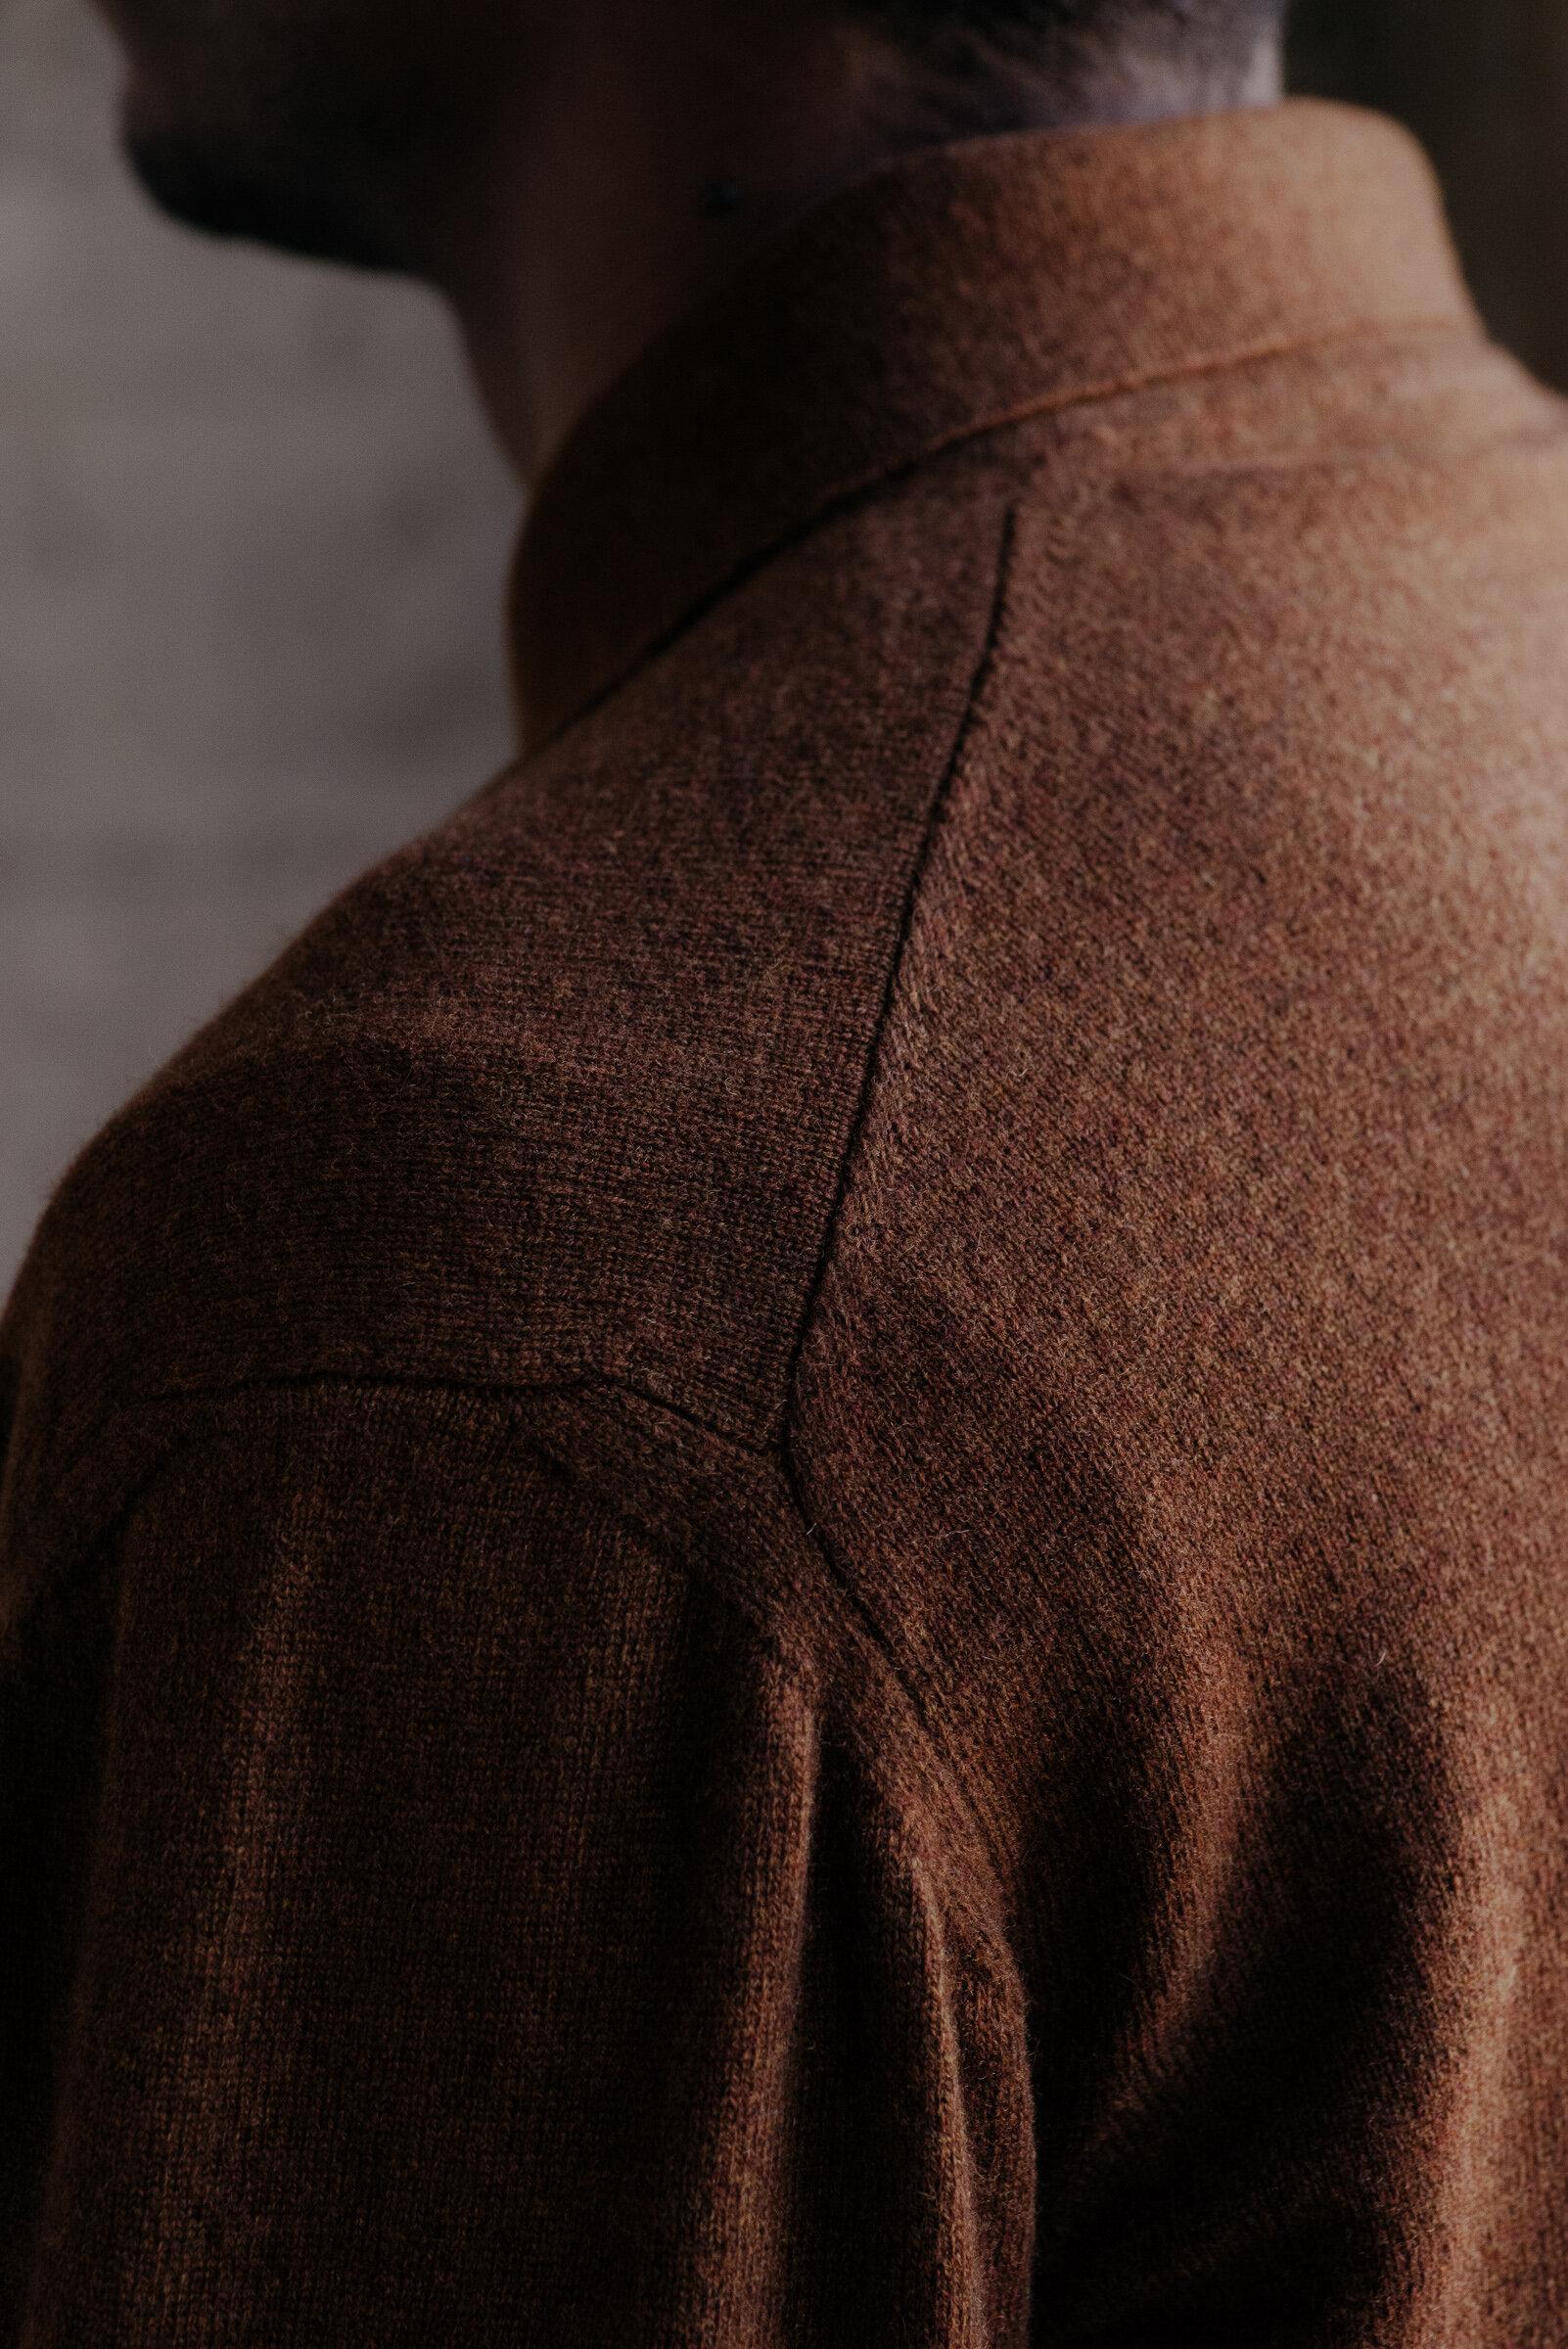 evan-kinori-knit-shirt-cashmere-lambswool-made-in-italy-27